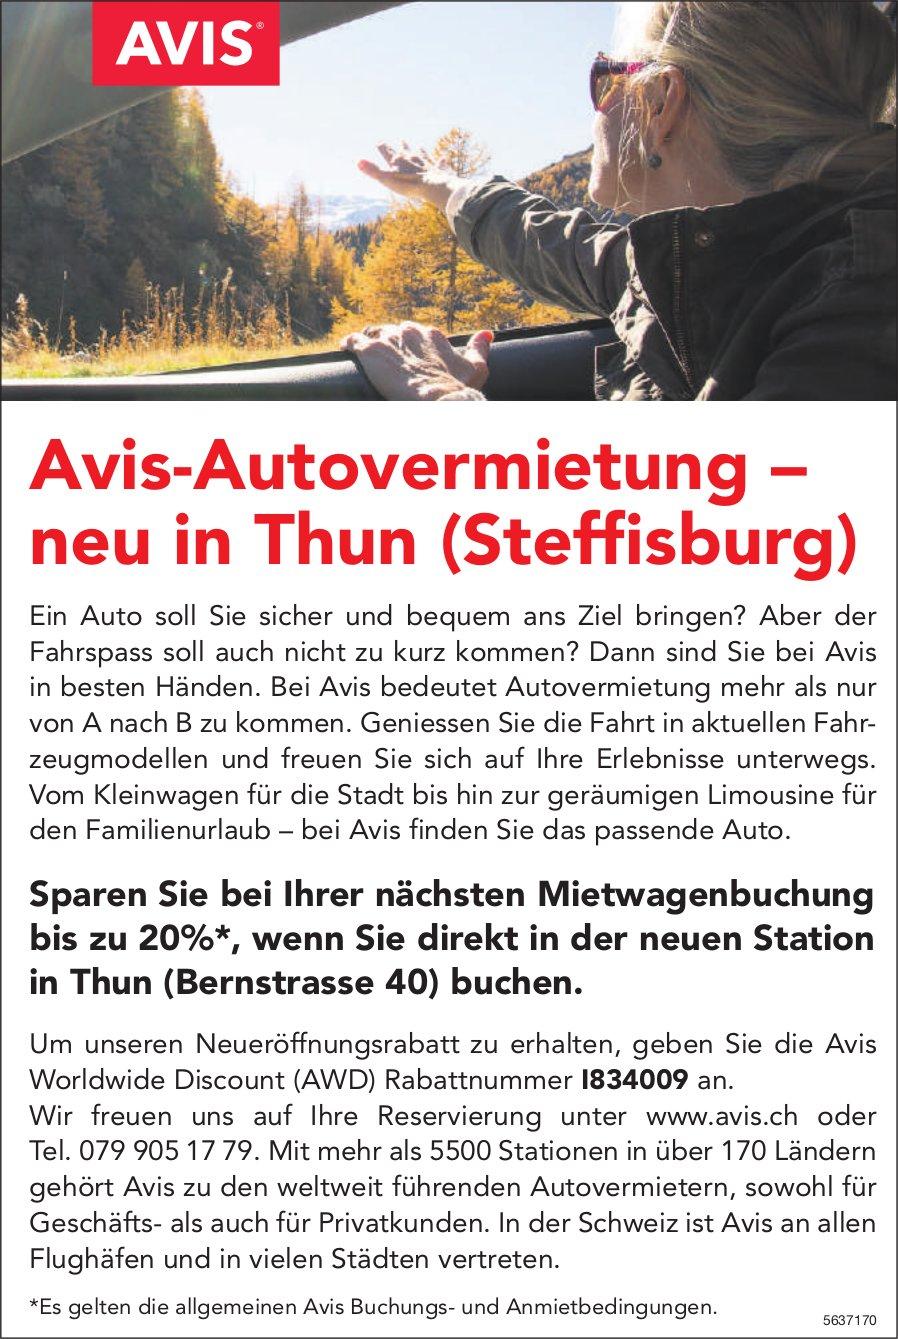 Avis-Autovermietung – neu in Thun (Steffisburg)